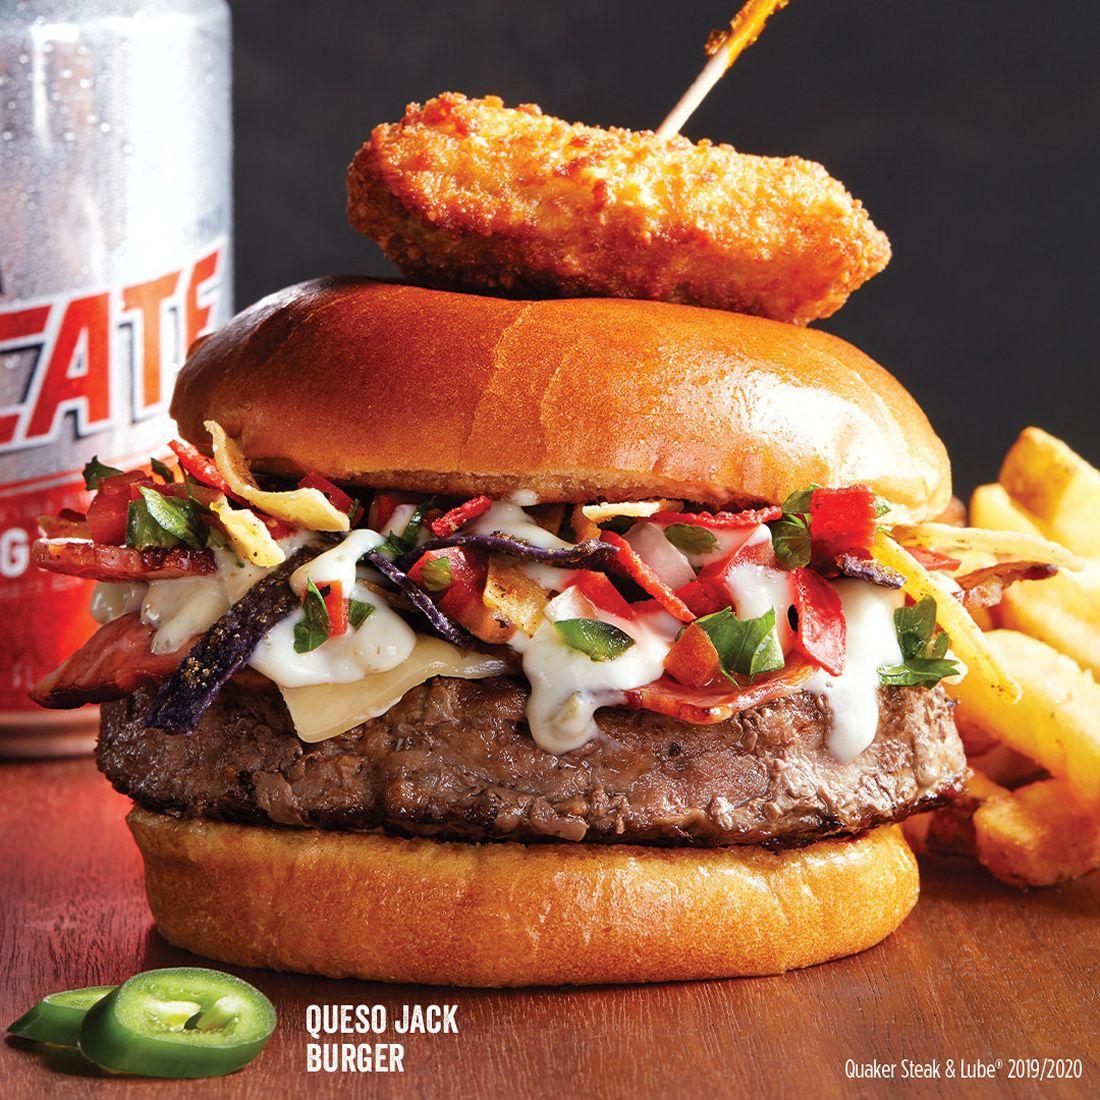 Quaker Steak & Lube Queso Jack Burger